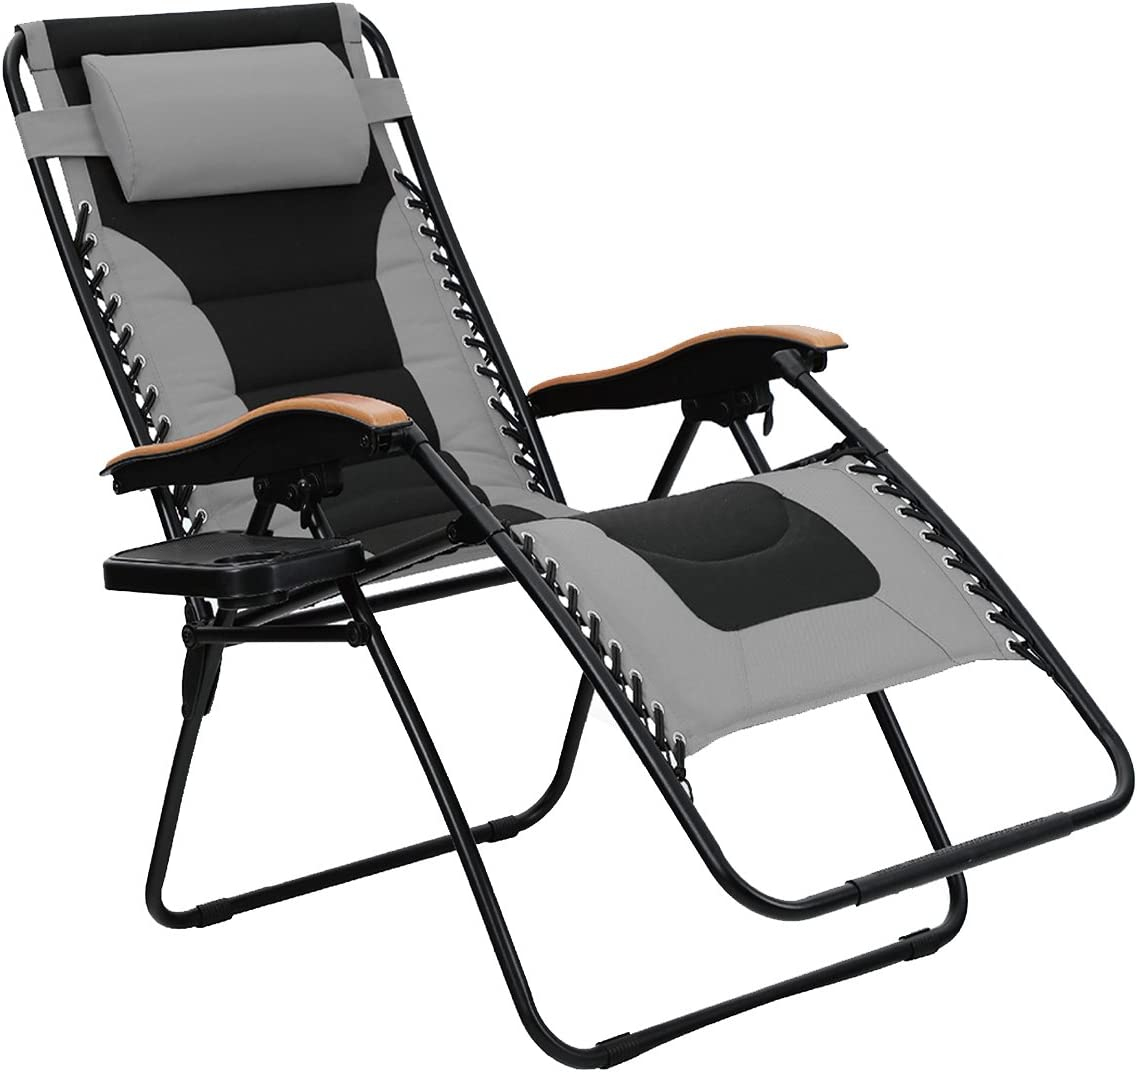 PHI VILLA XL Padded Seat Oversized Zero Gravity Chair